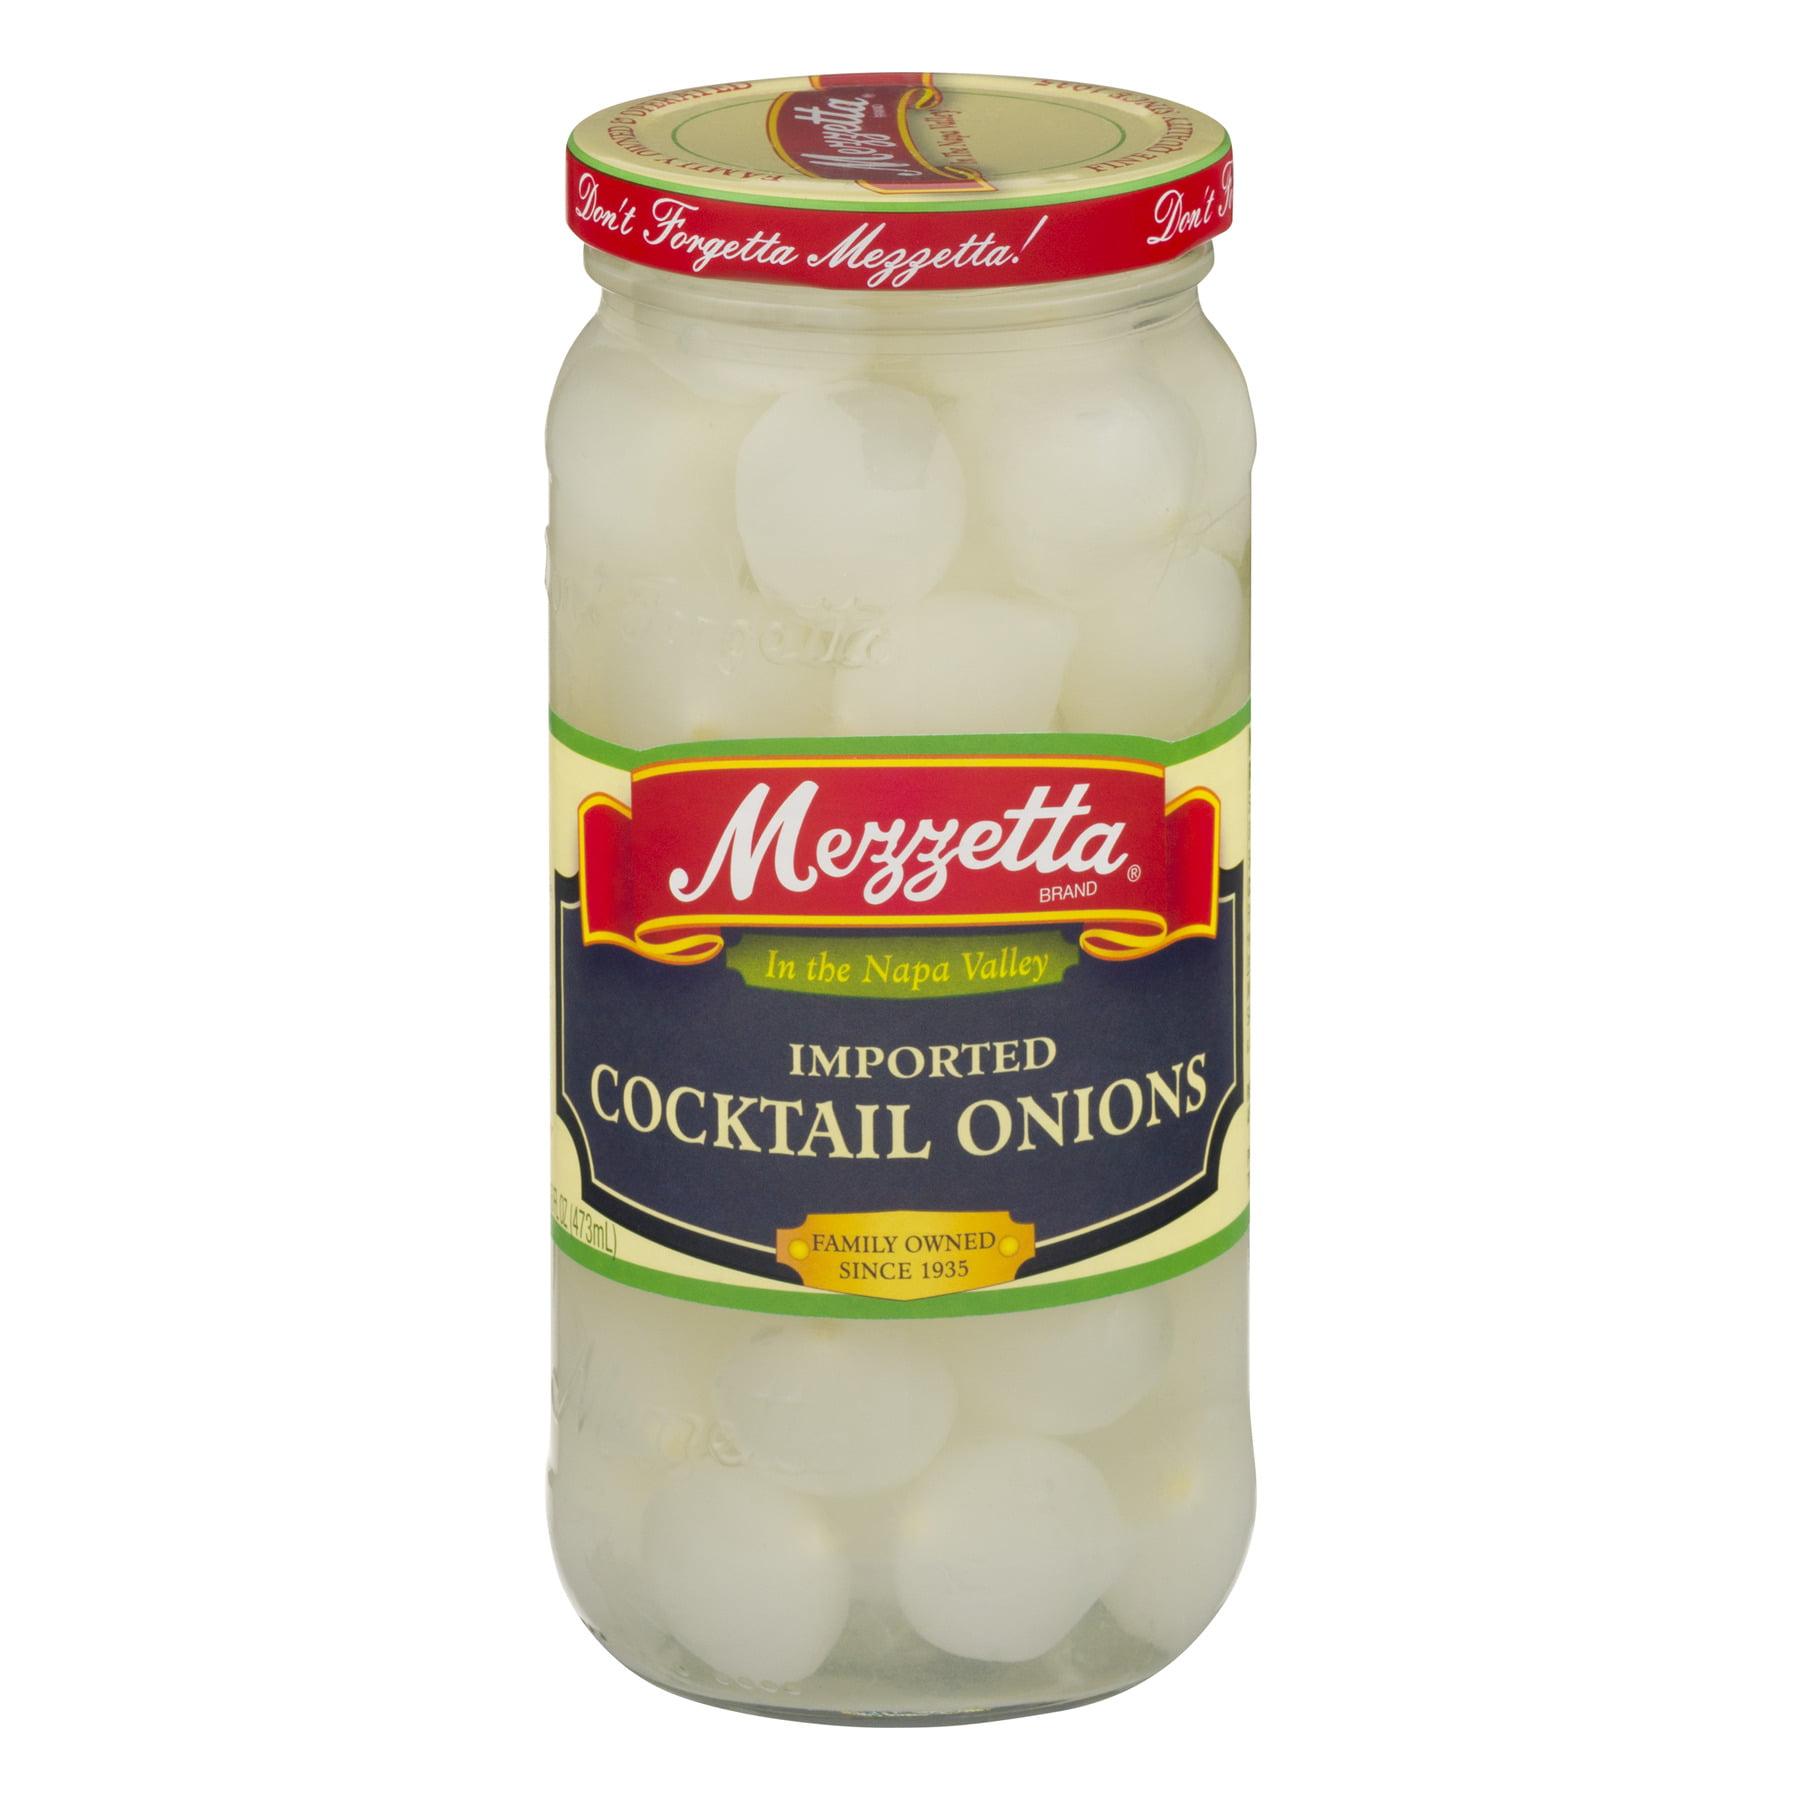 (6 Pack) Mezzetta Imported Cocktail Onions, 16 Oz